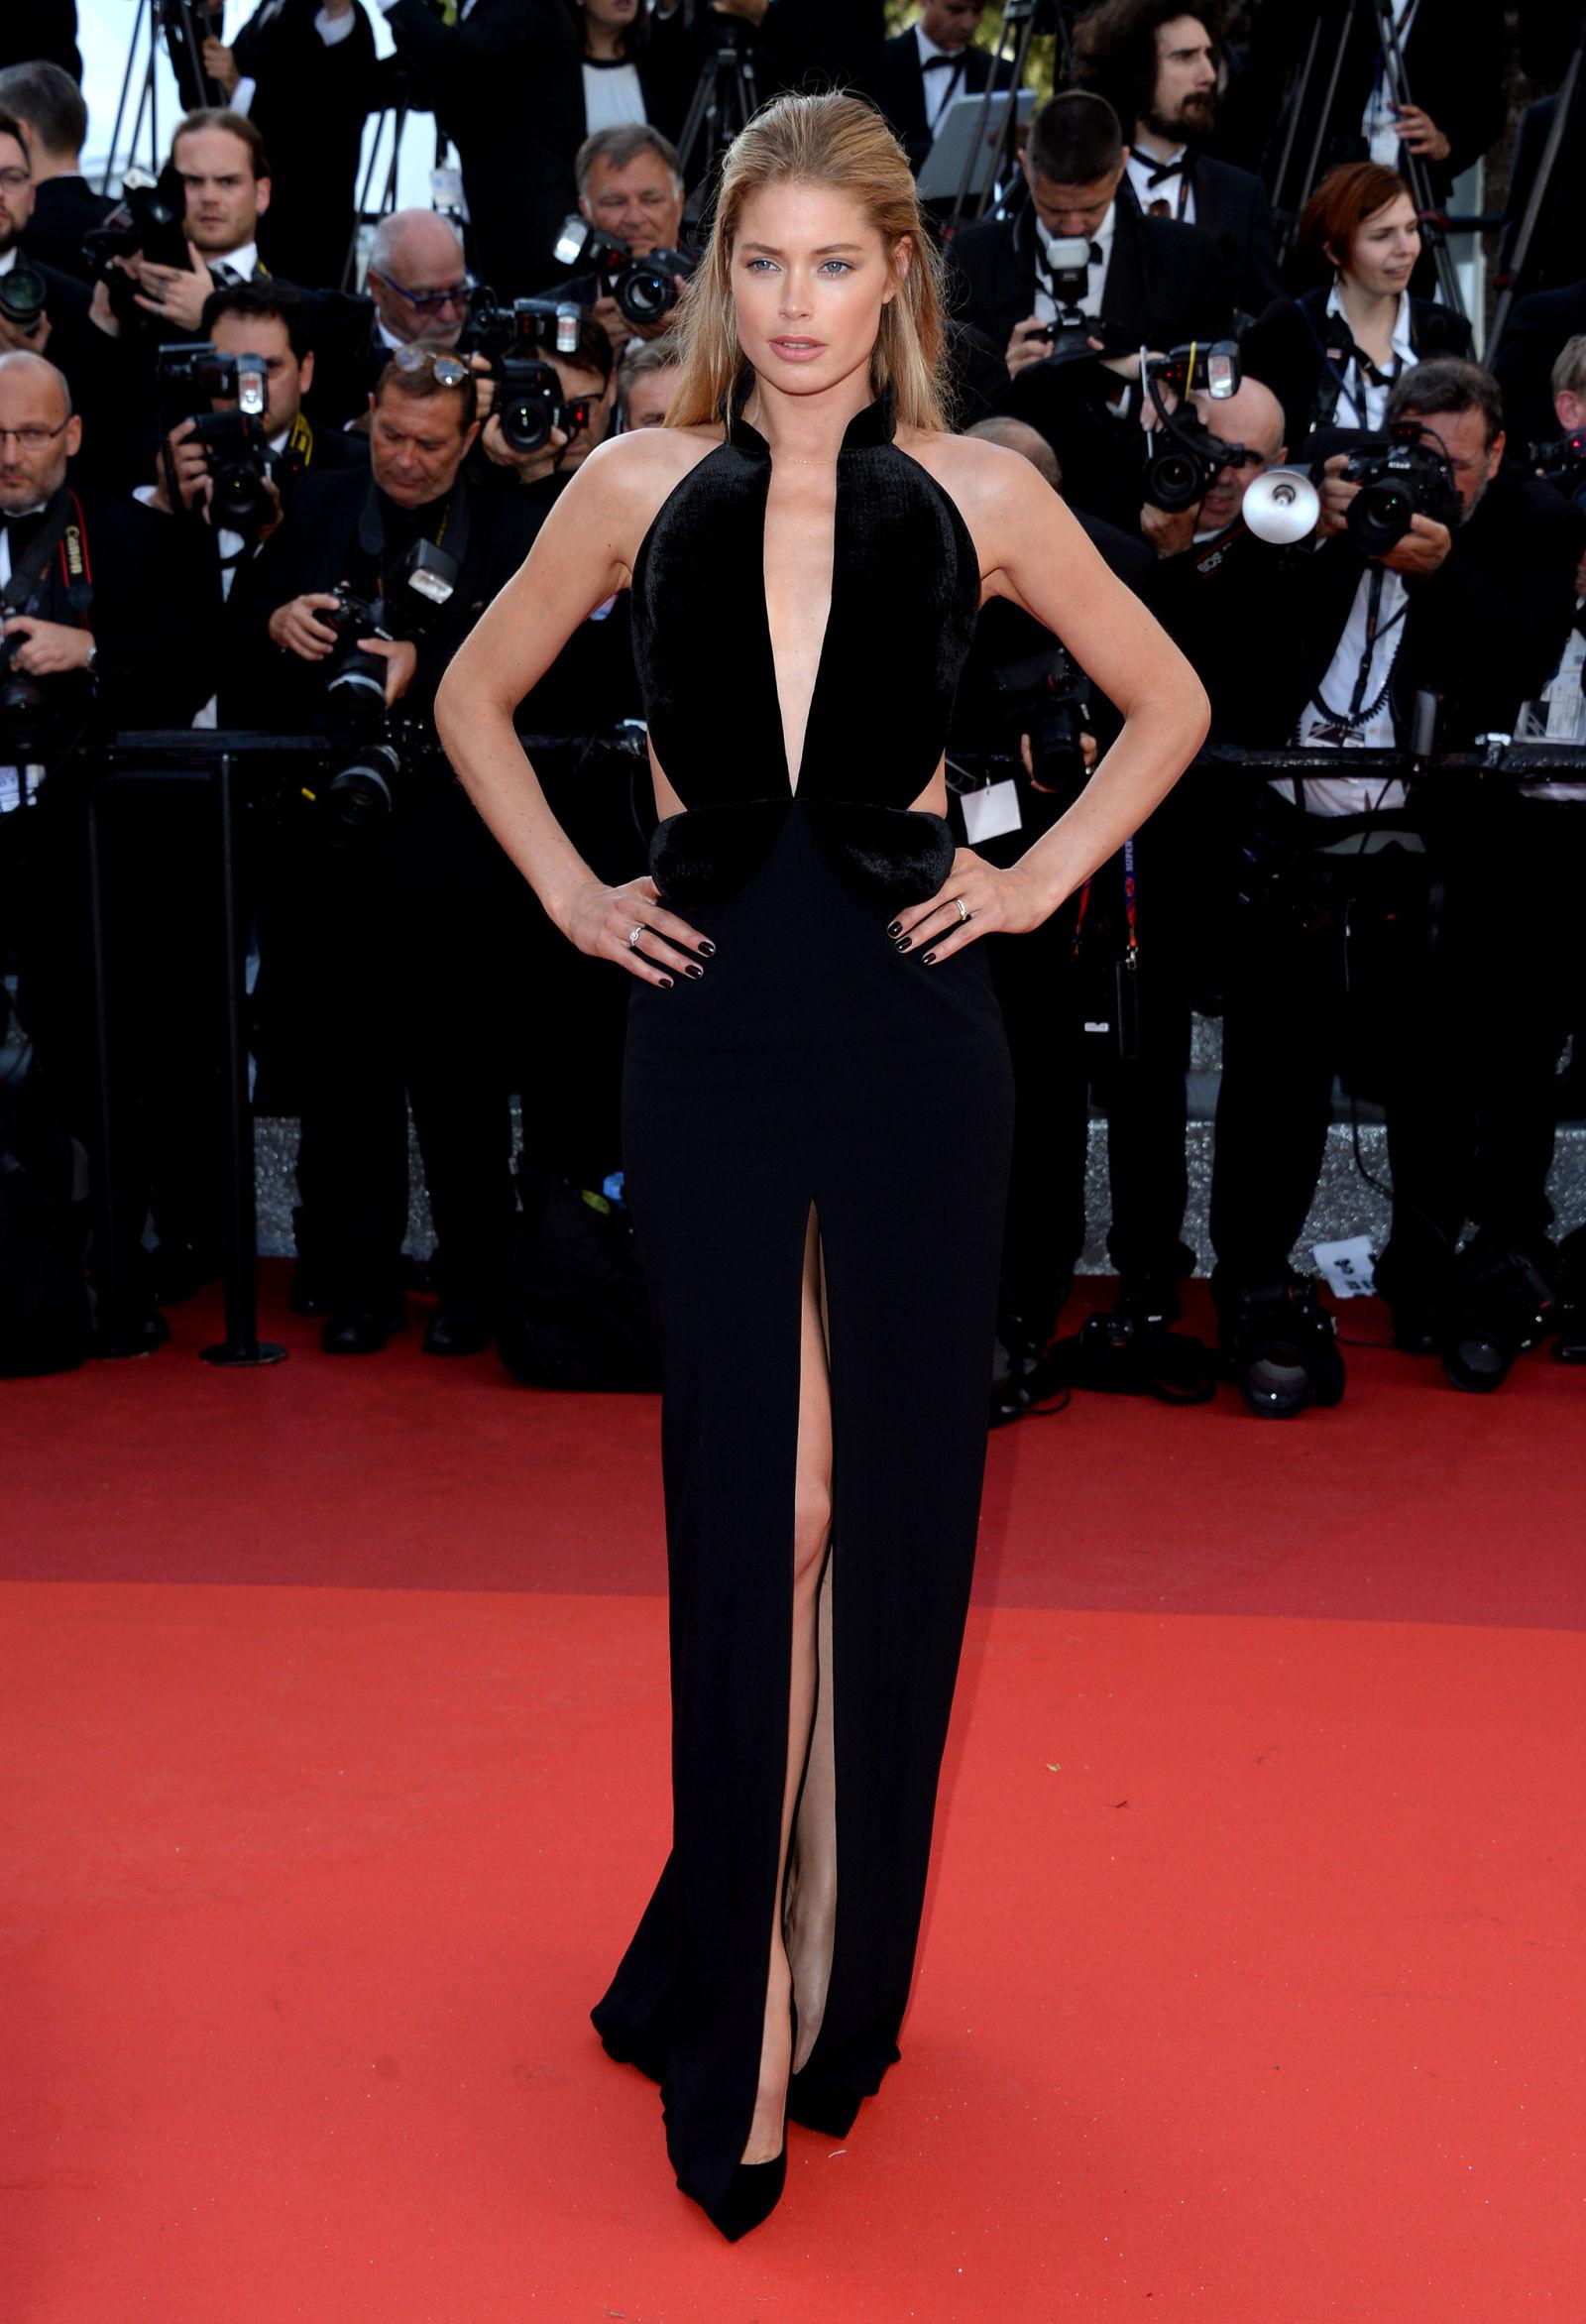 Doutzen Kroes hairstyles Cannes 2016